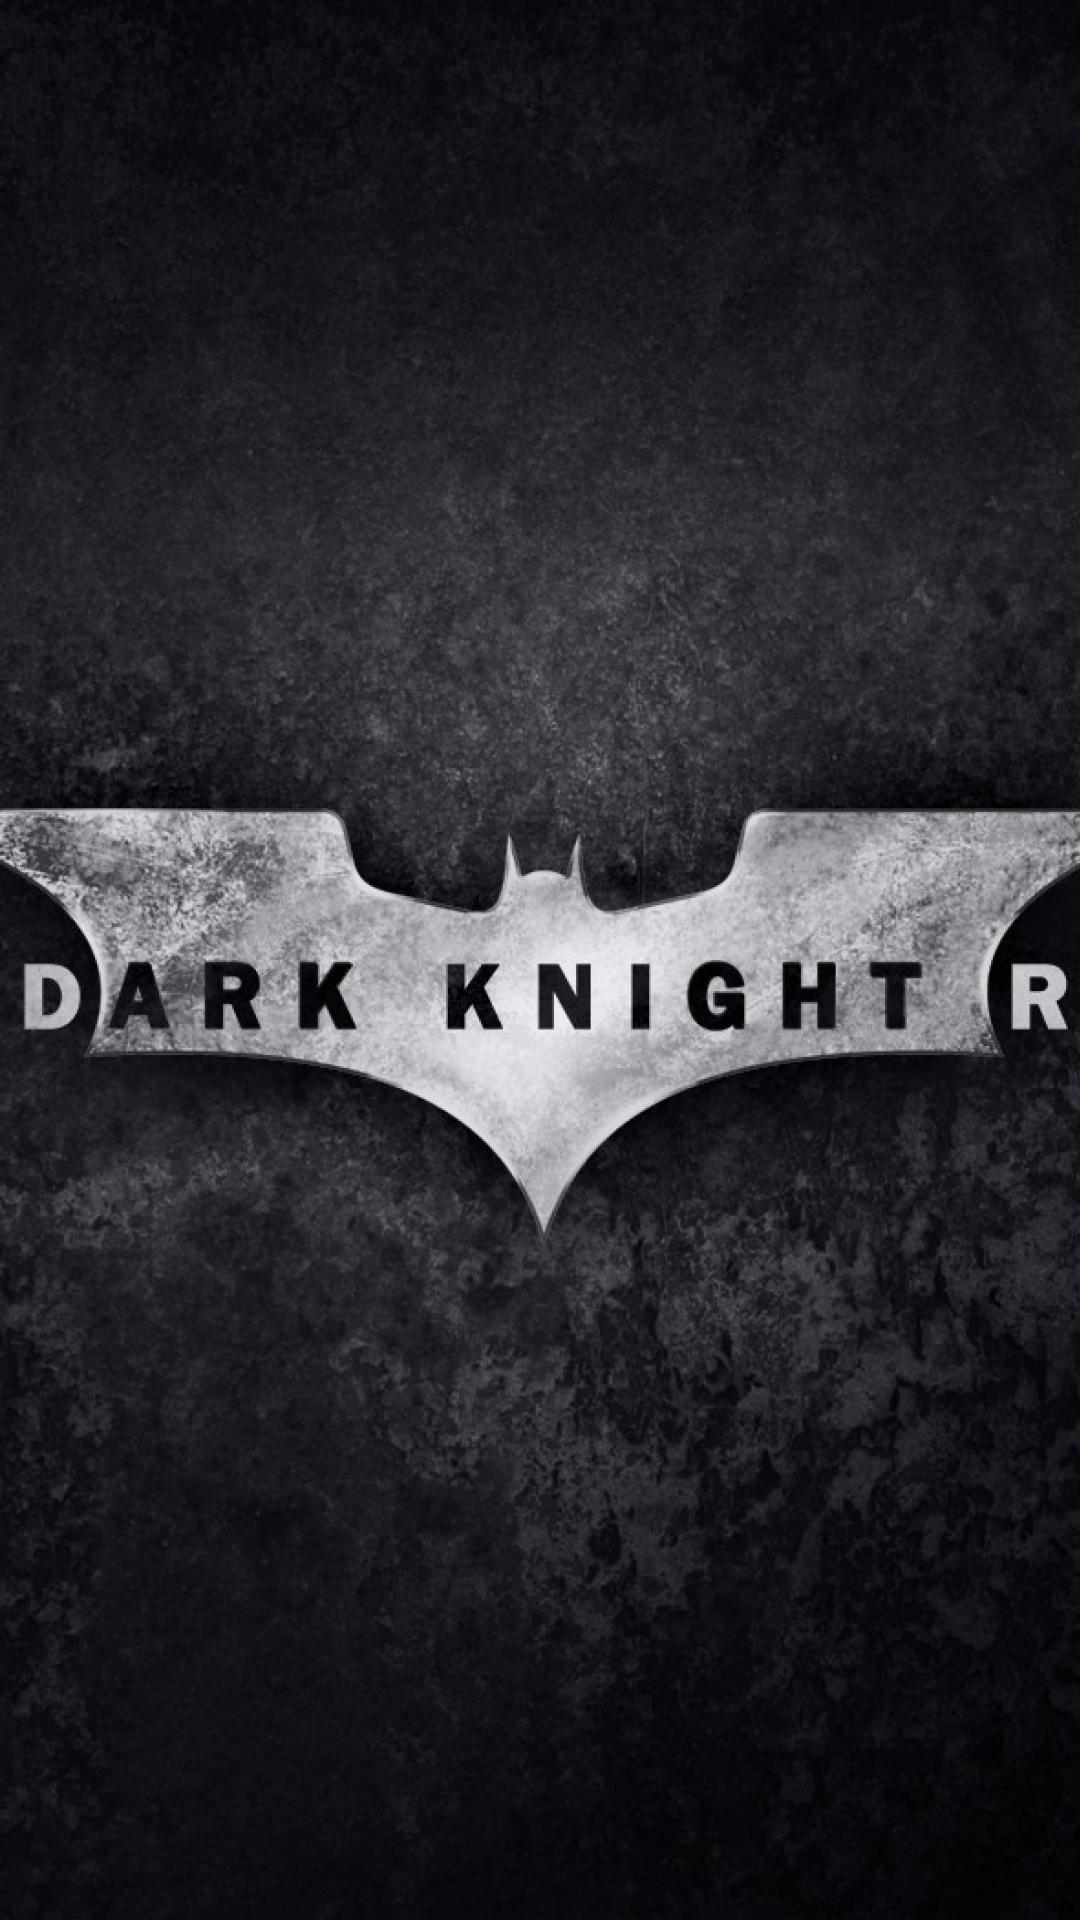 dark knight logo wallpaper wallpapersafari